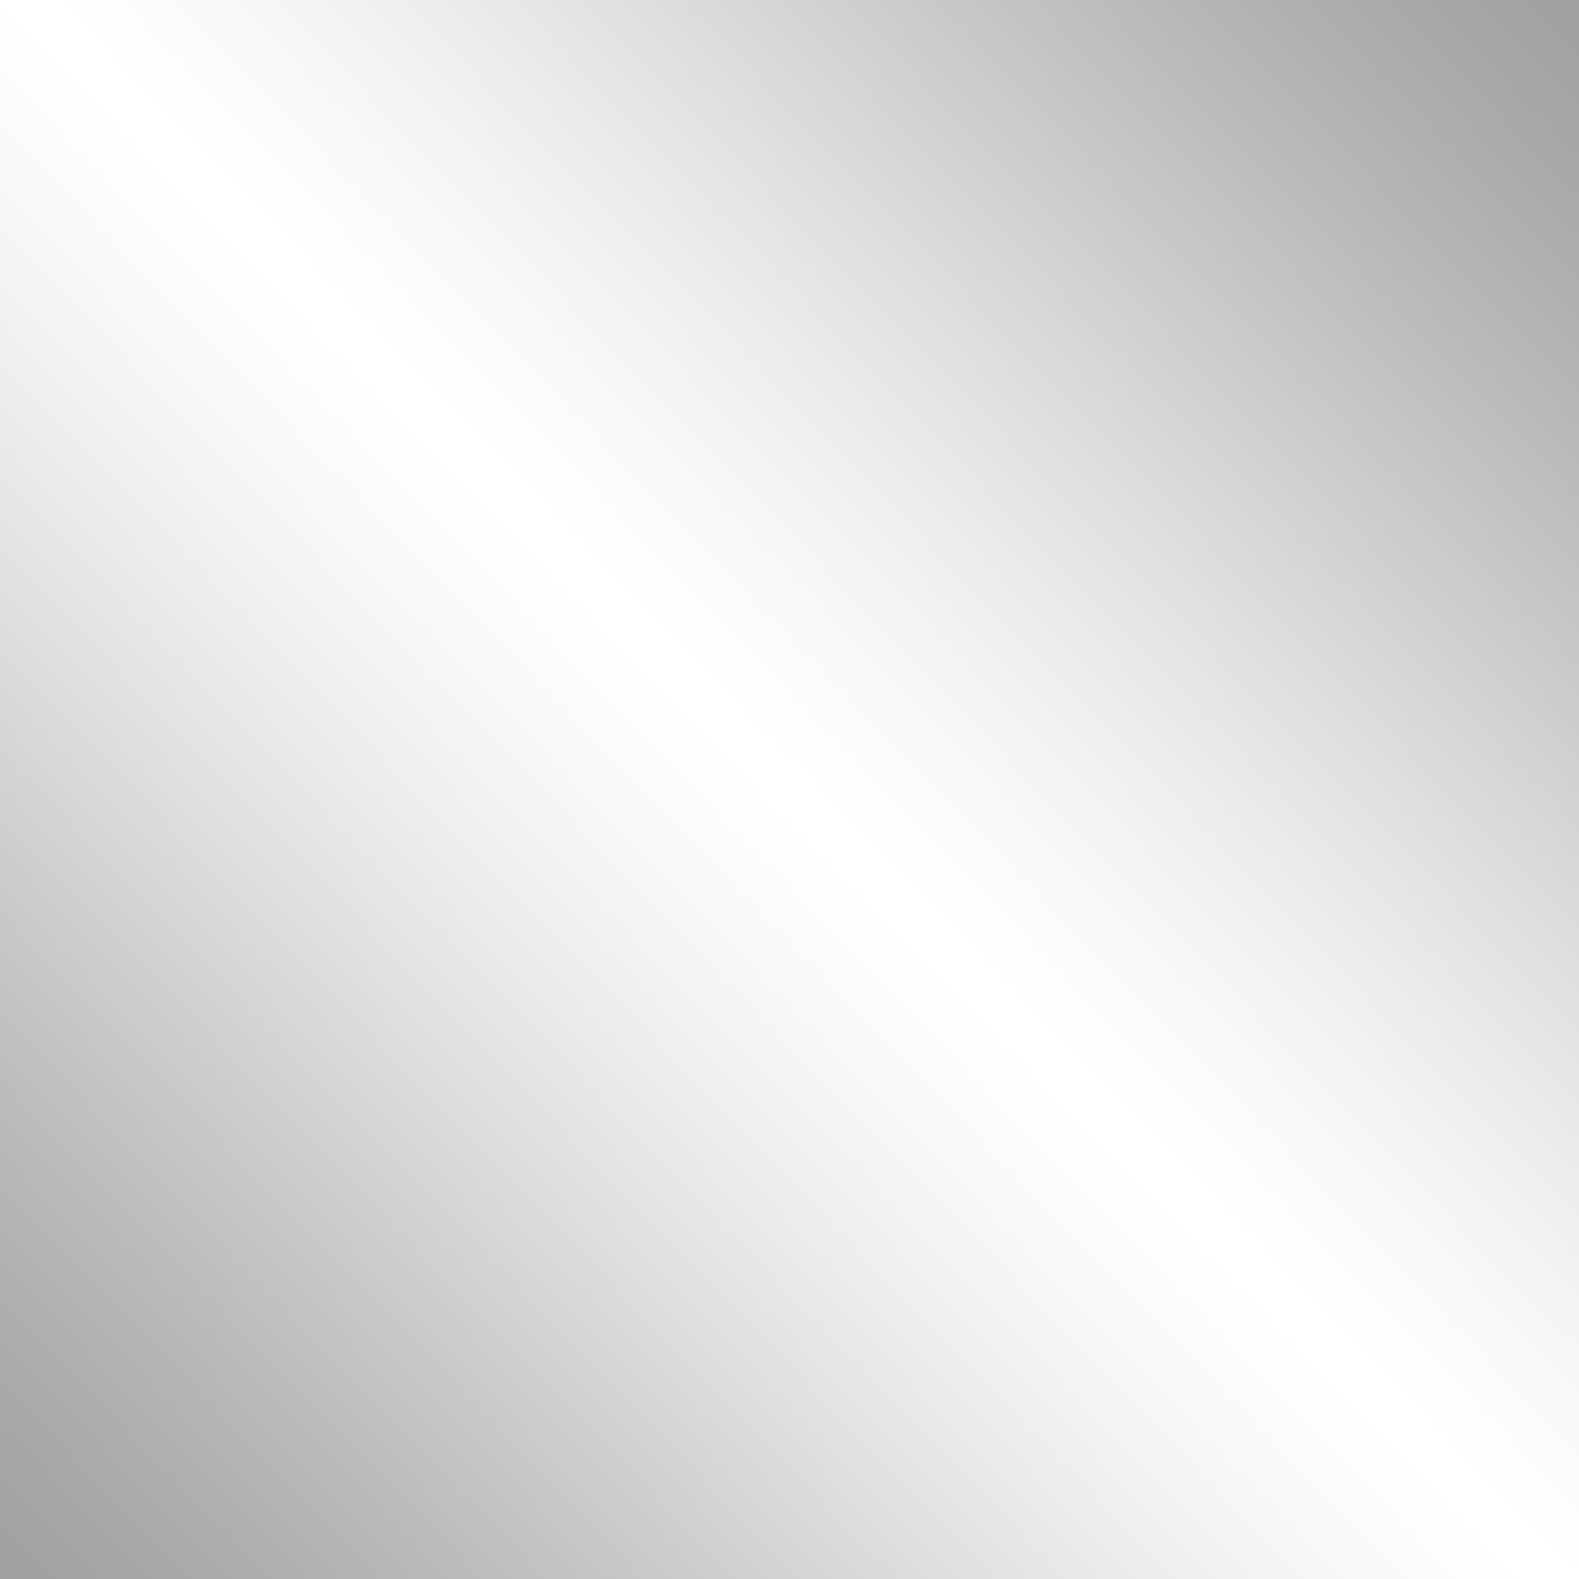 Silver Page bg.jpg